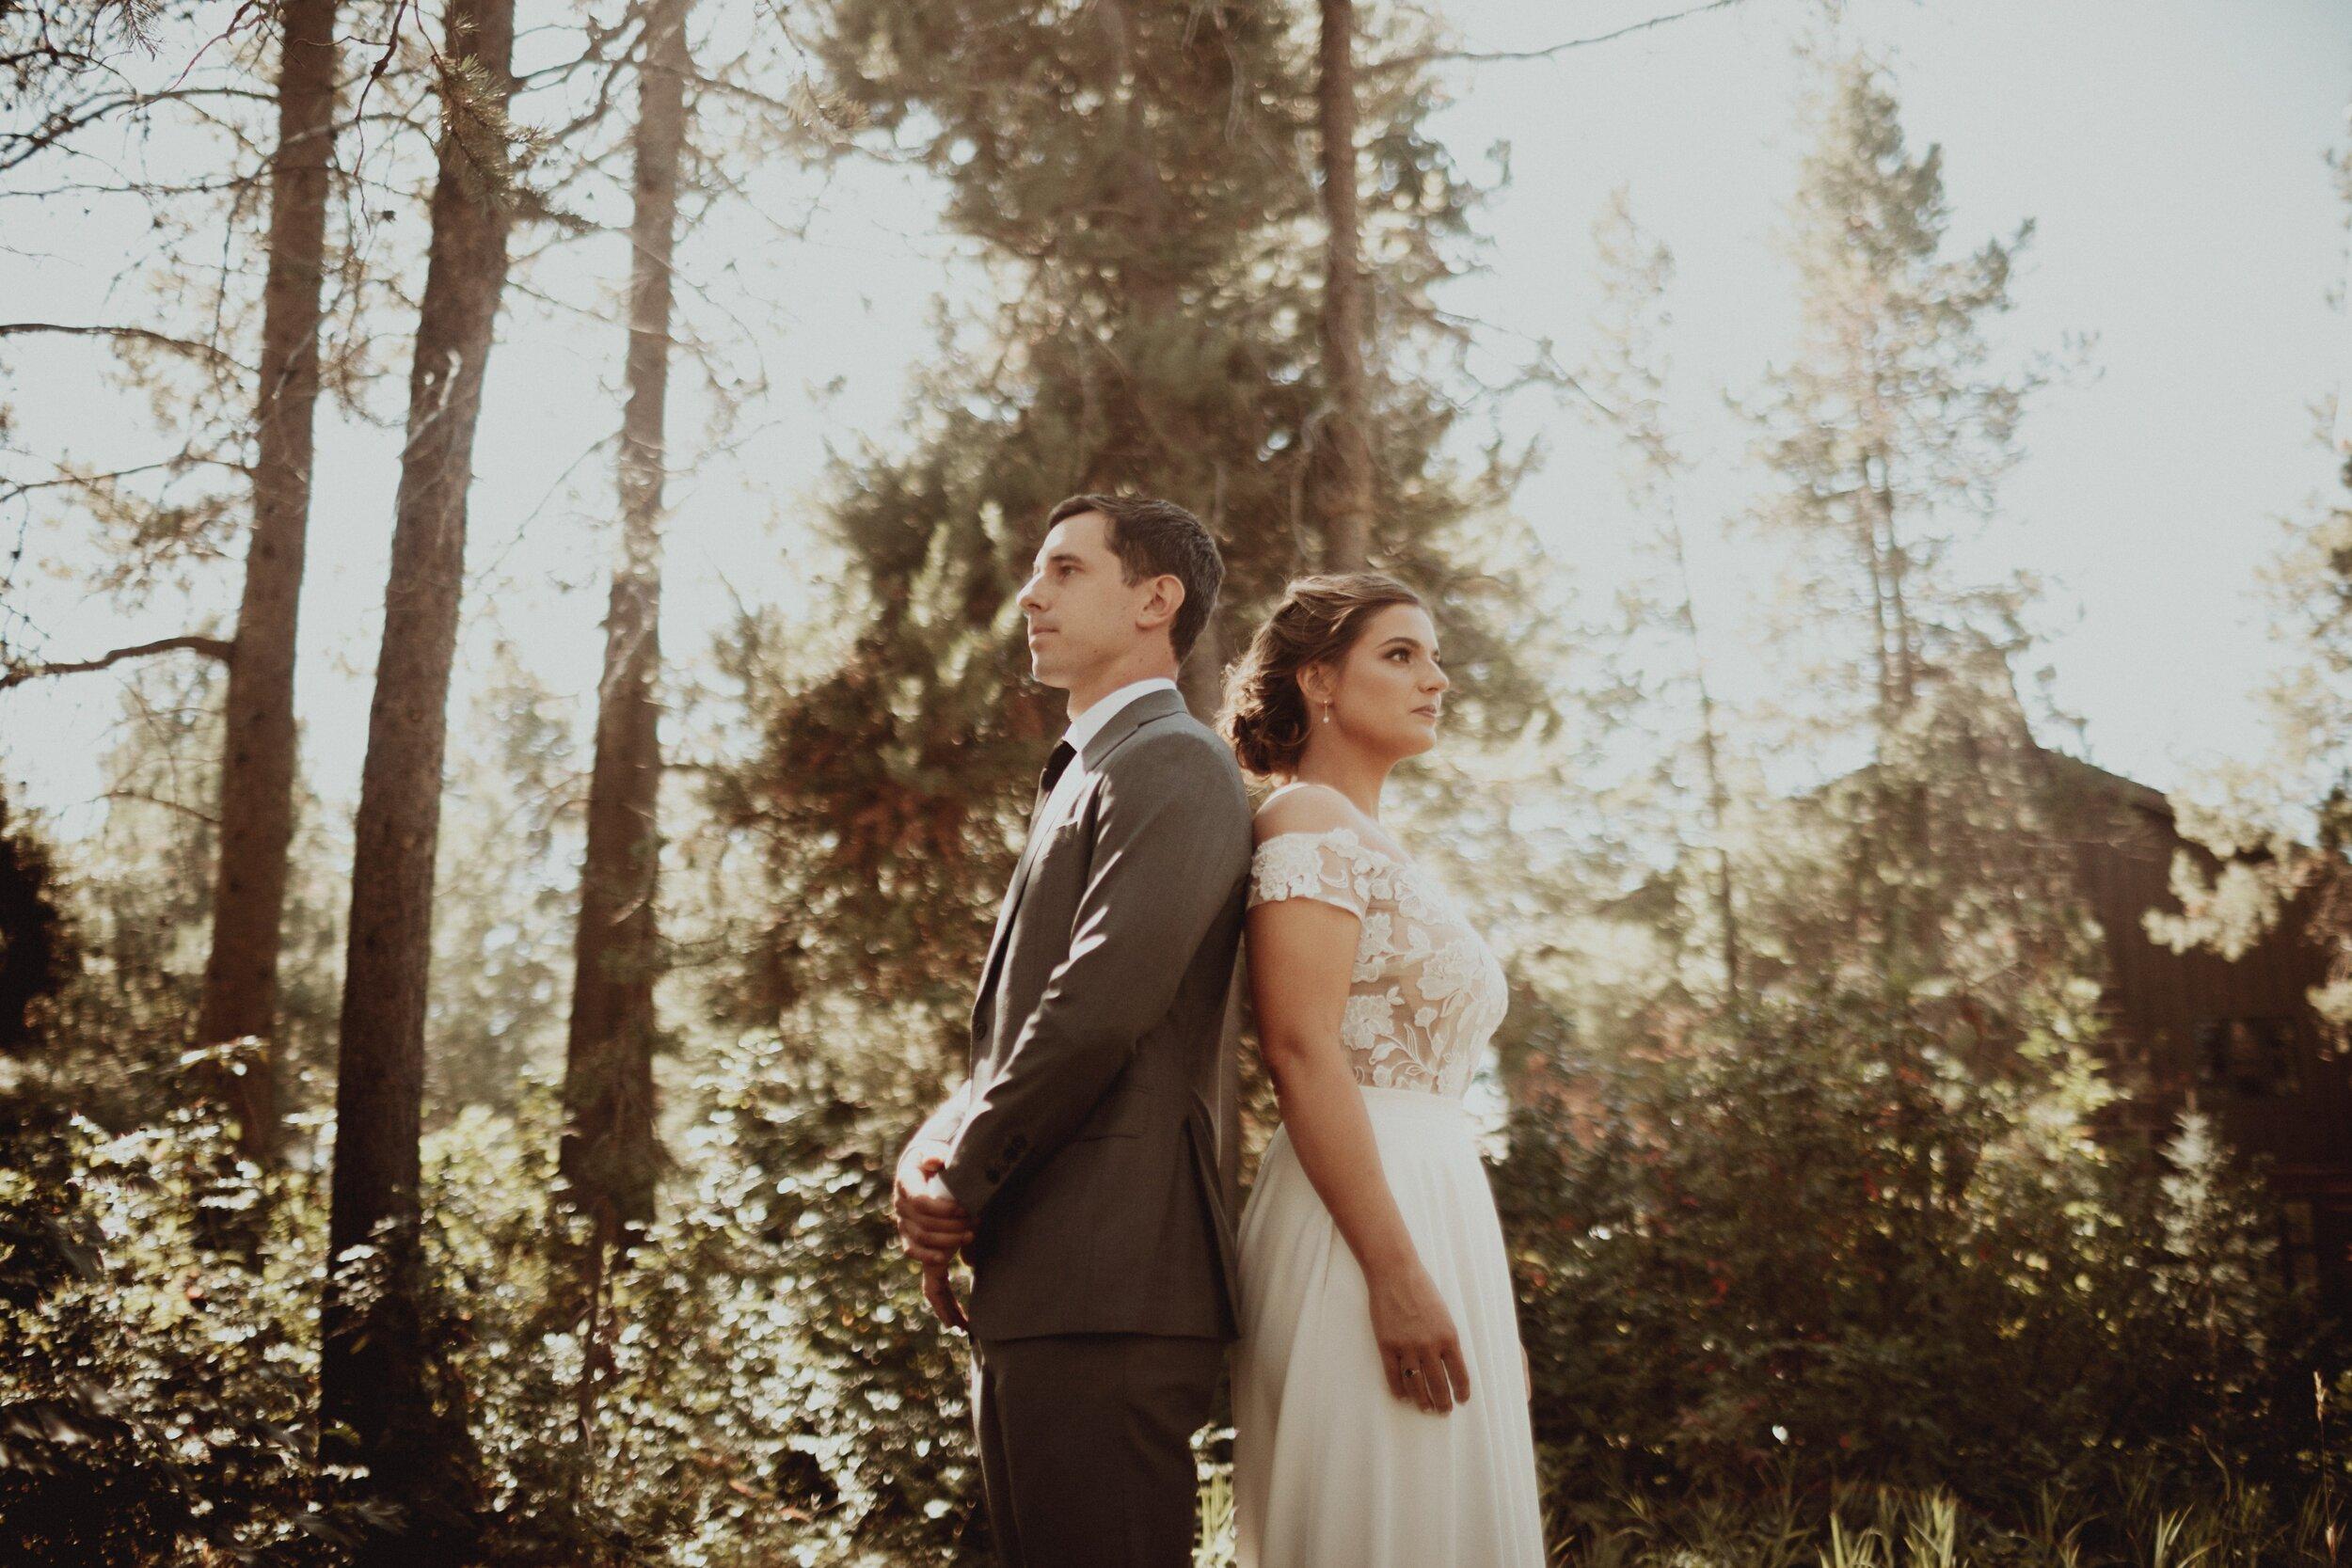 J and M Wed in Sunriver.Lauren Apel Photo215.jpg